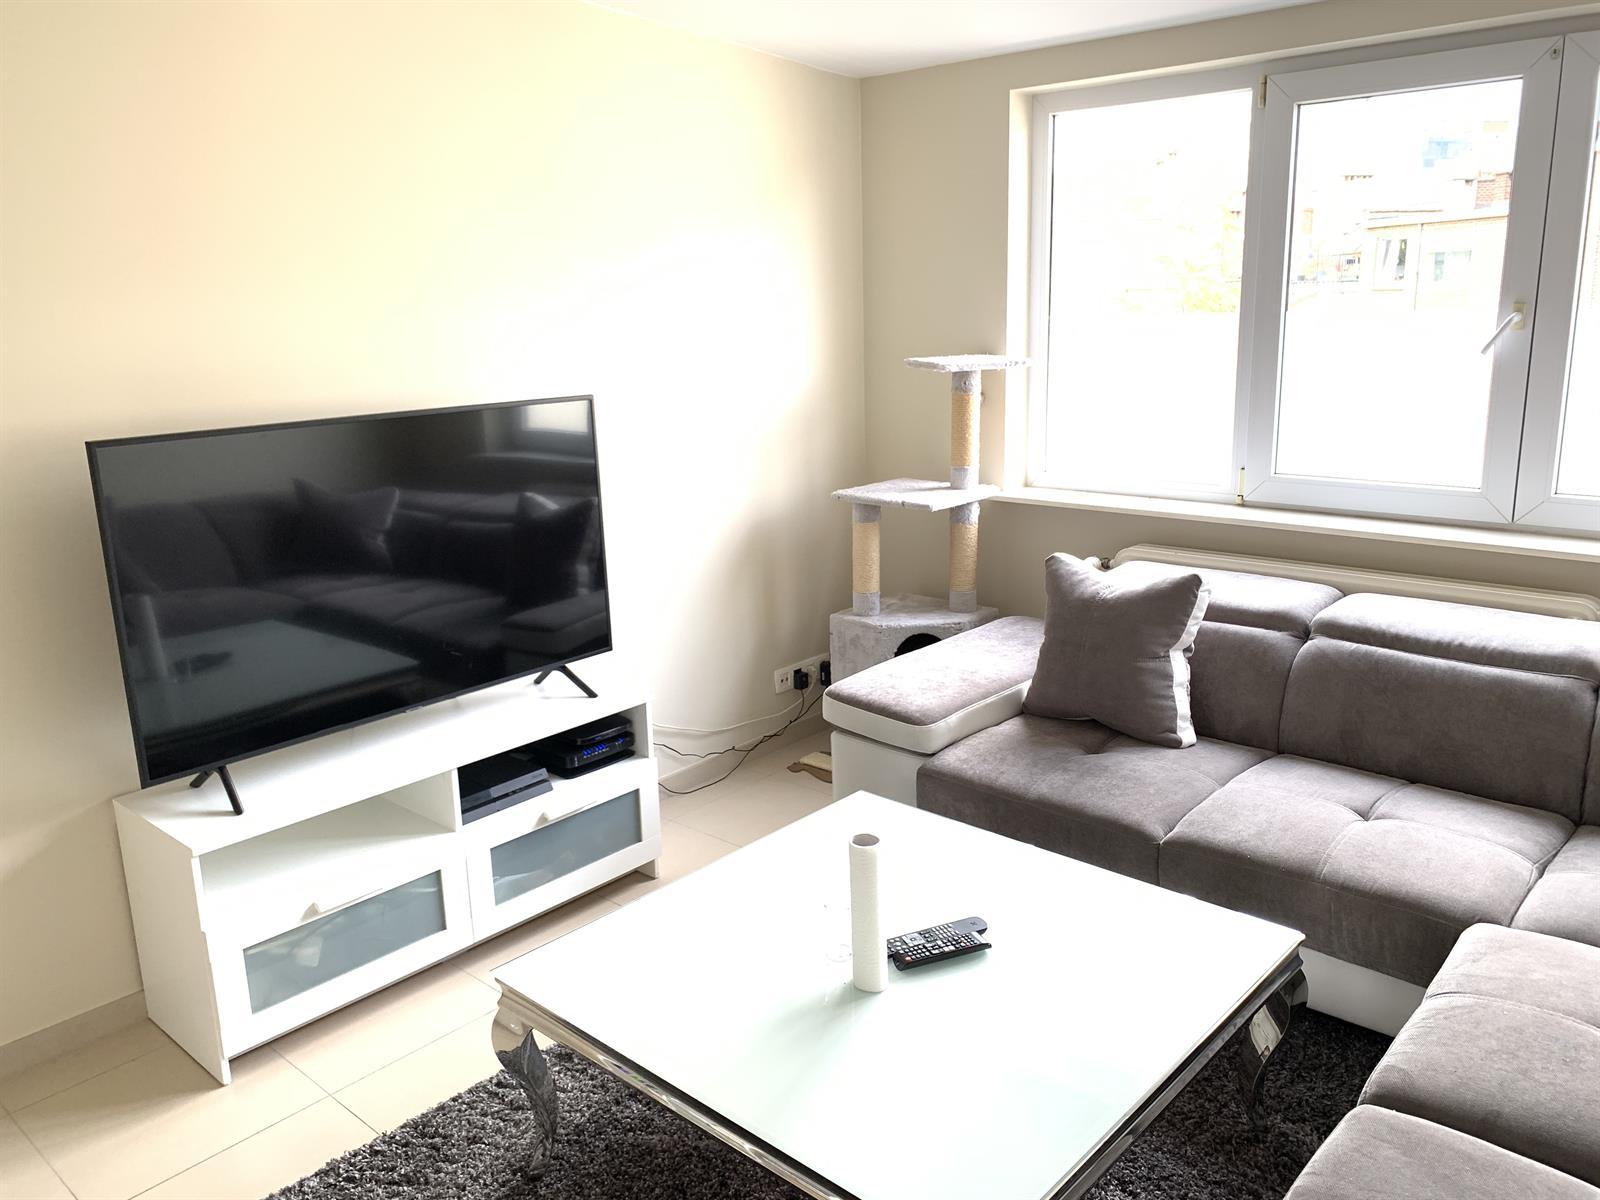 Appartement - Woluwe-Saint-Lambert - #4286376-12